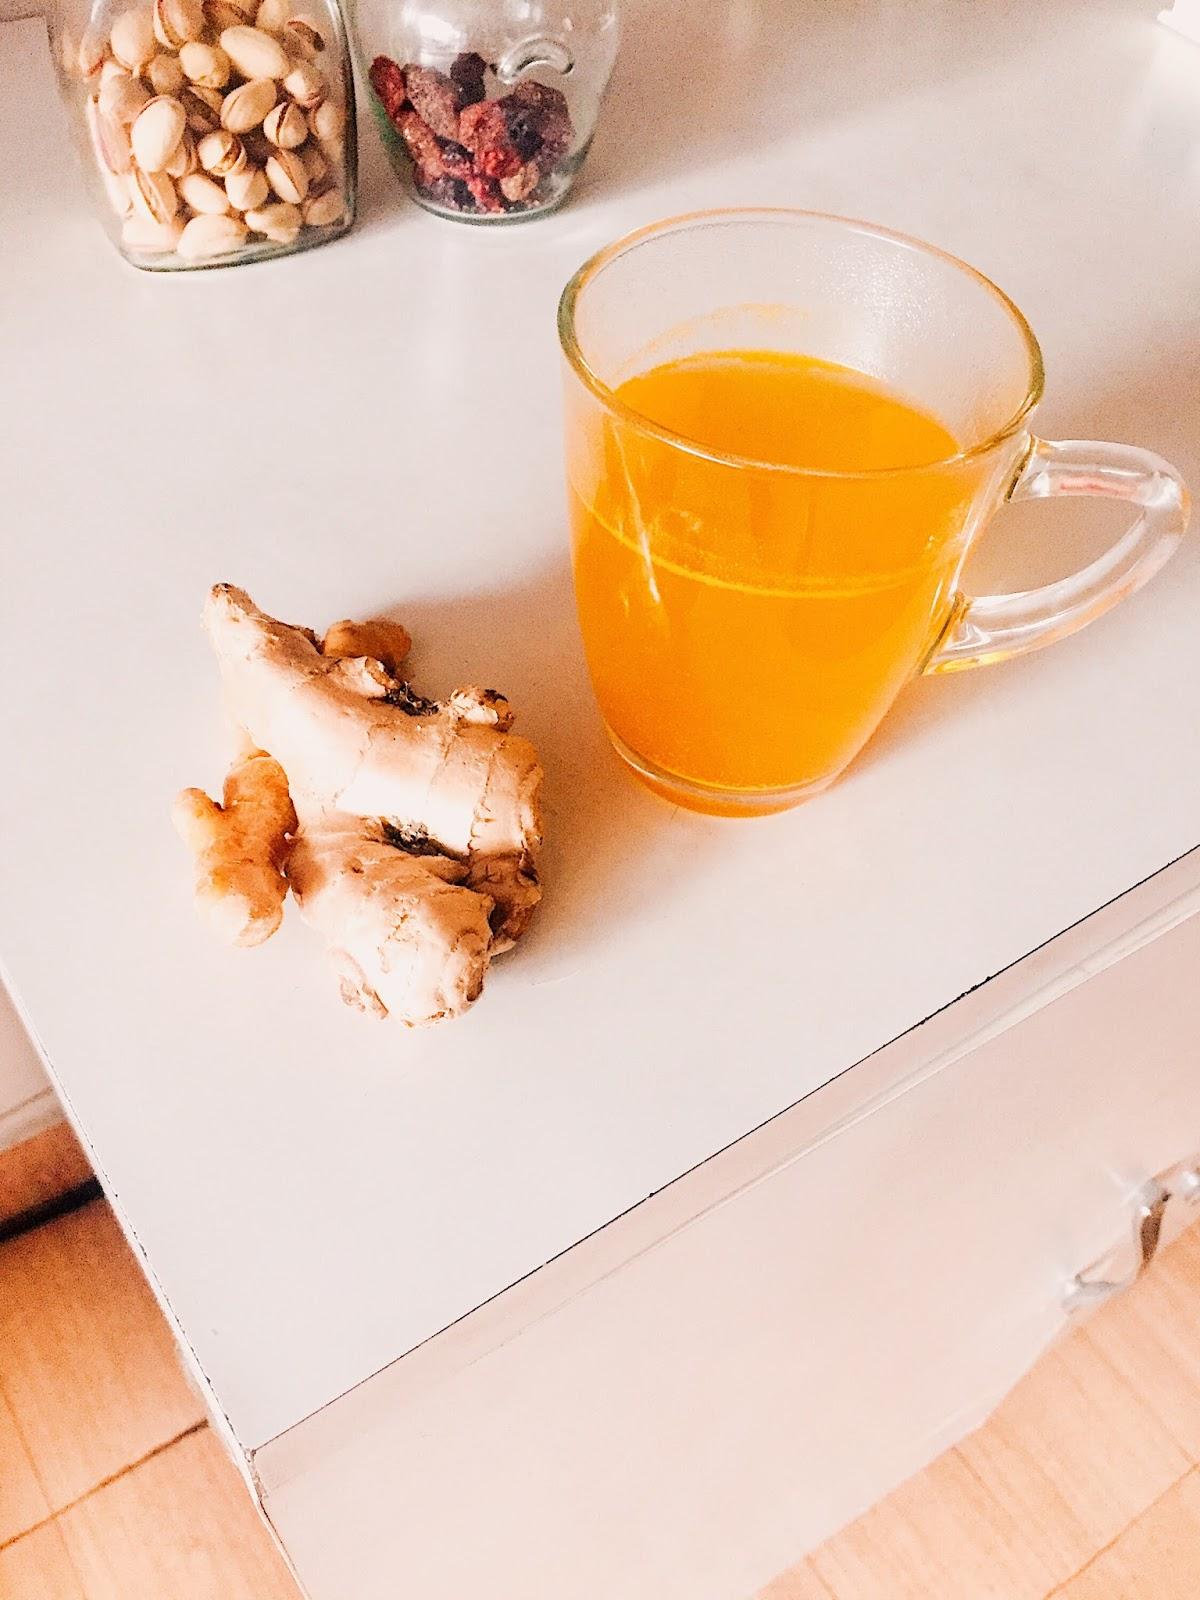 home remedies to fight cough, indian home remedies to fight cough, home remedy to get rid of cough, turmeric tea, ginger tea, tulsi tea